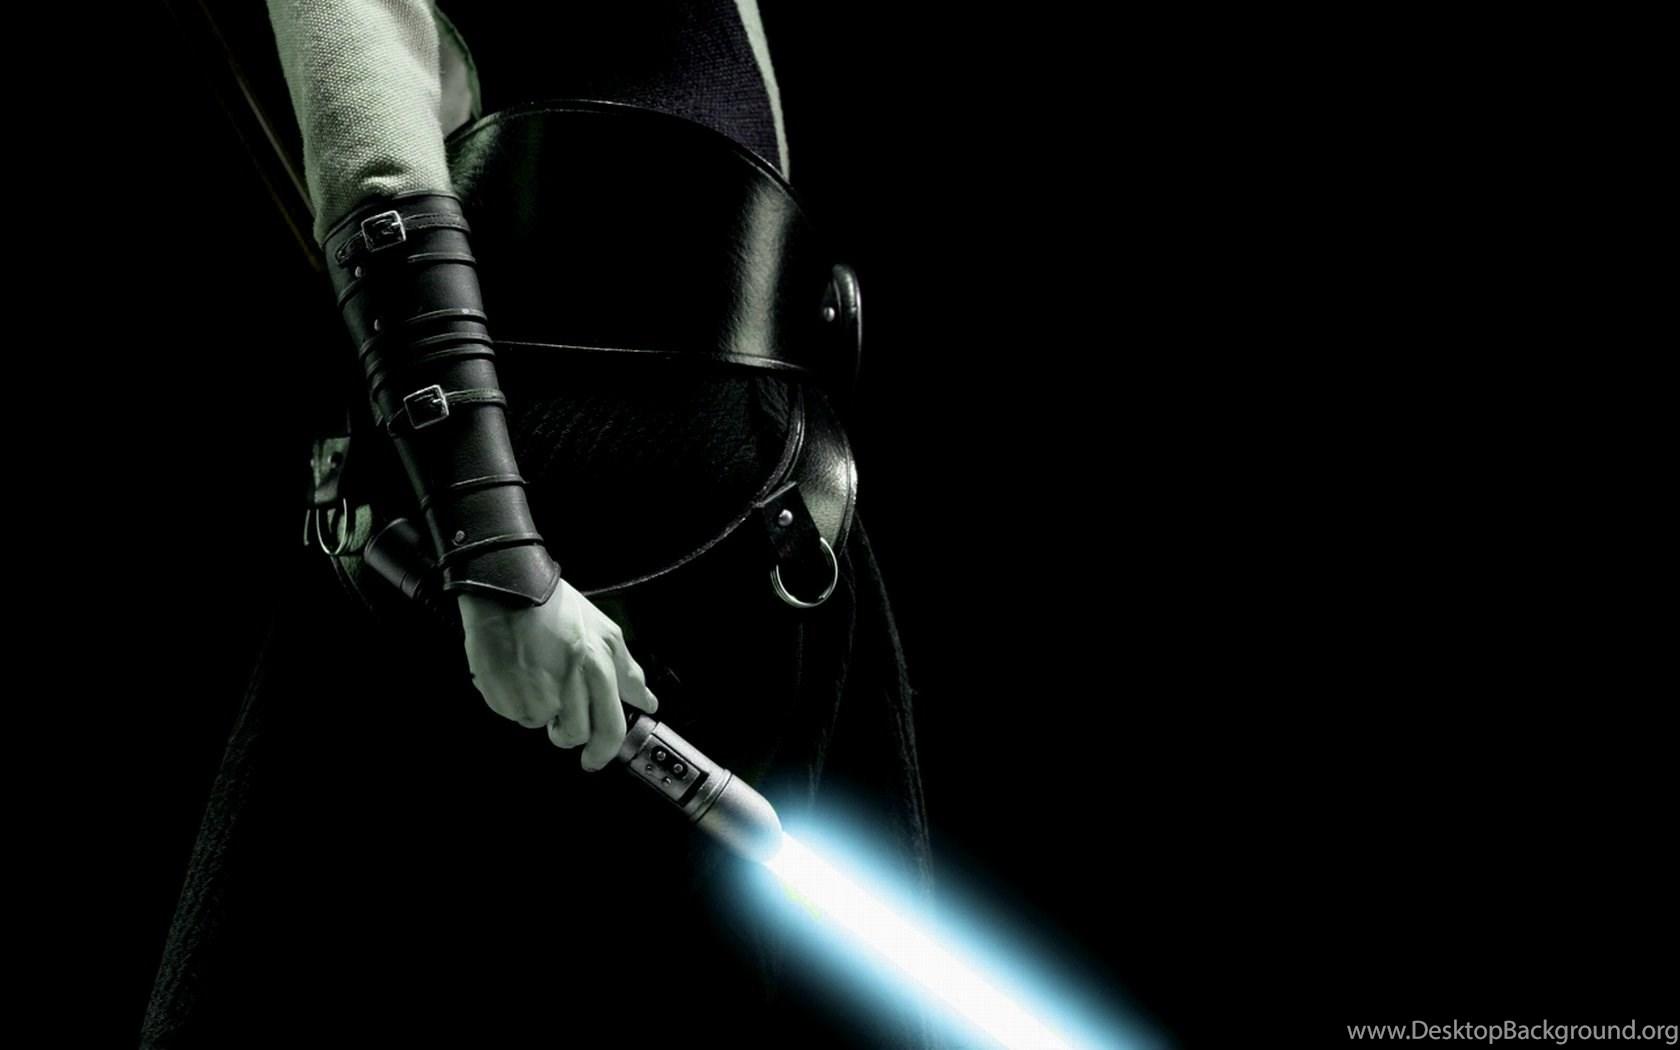 Star Wars Jedi Wallpapers Desktop Background